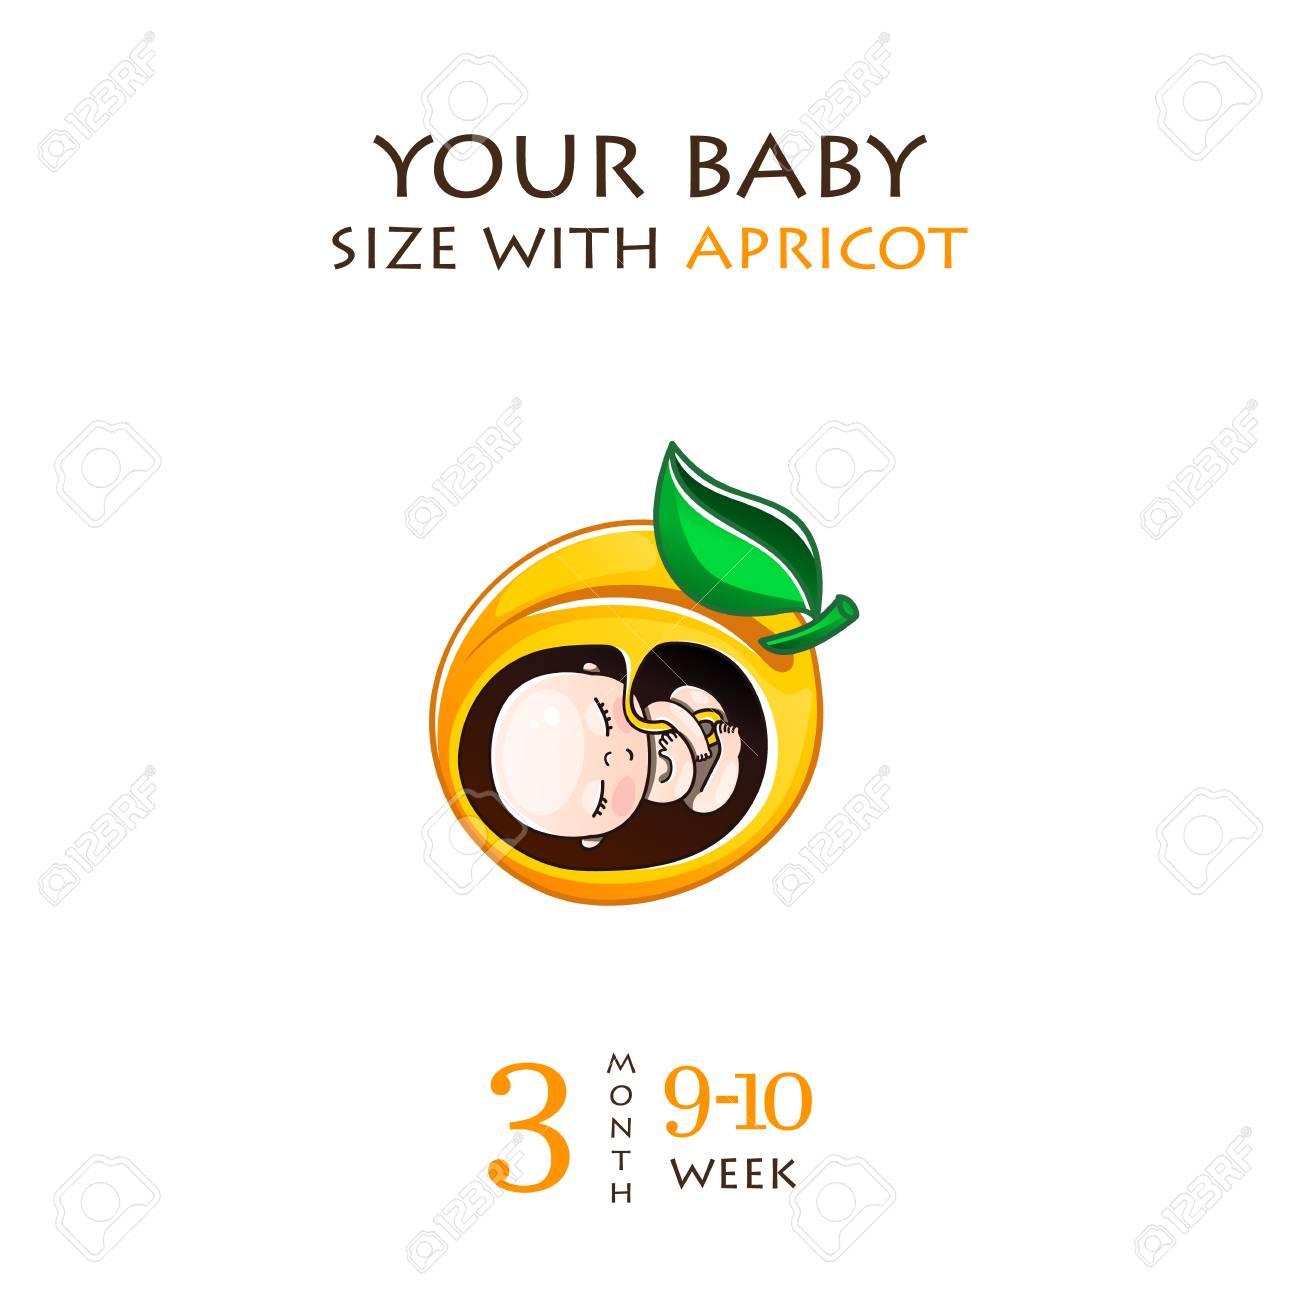 10 Week Pregnancy Baby Size